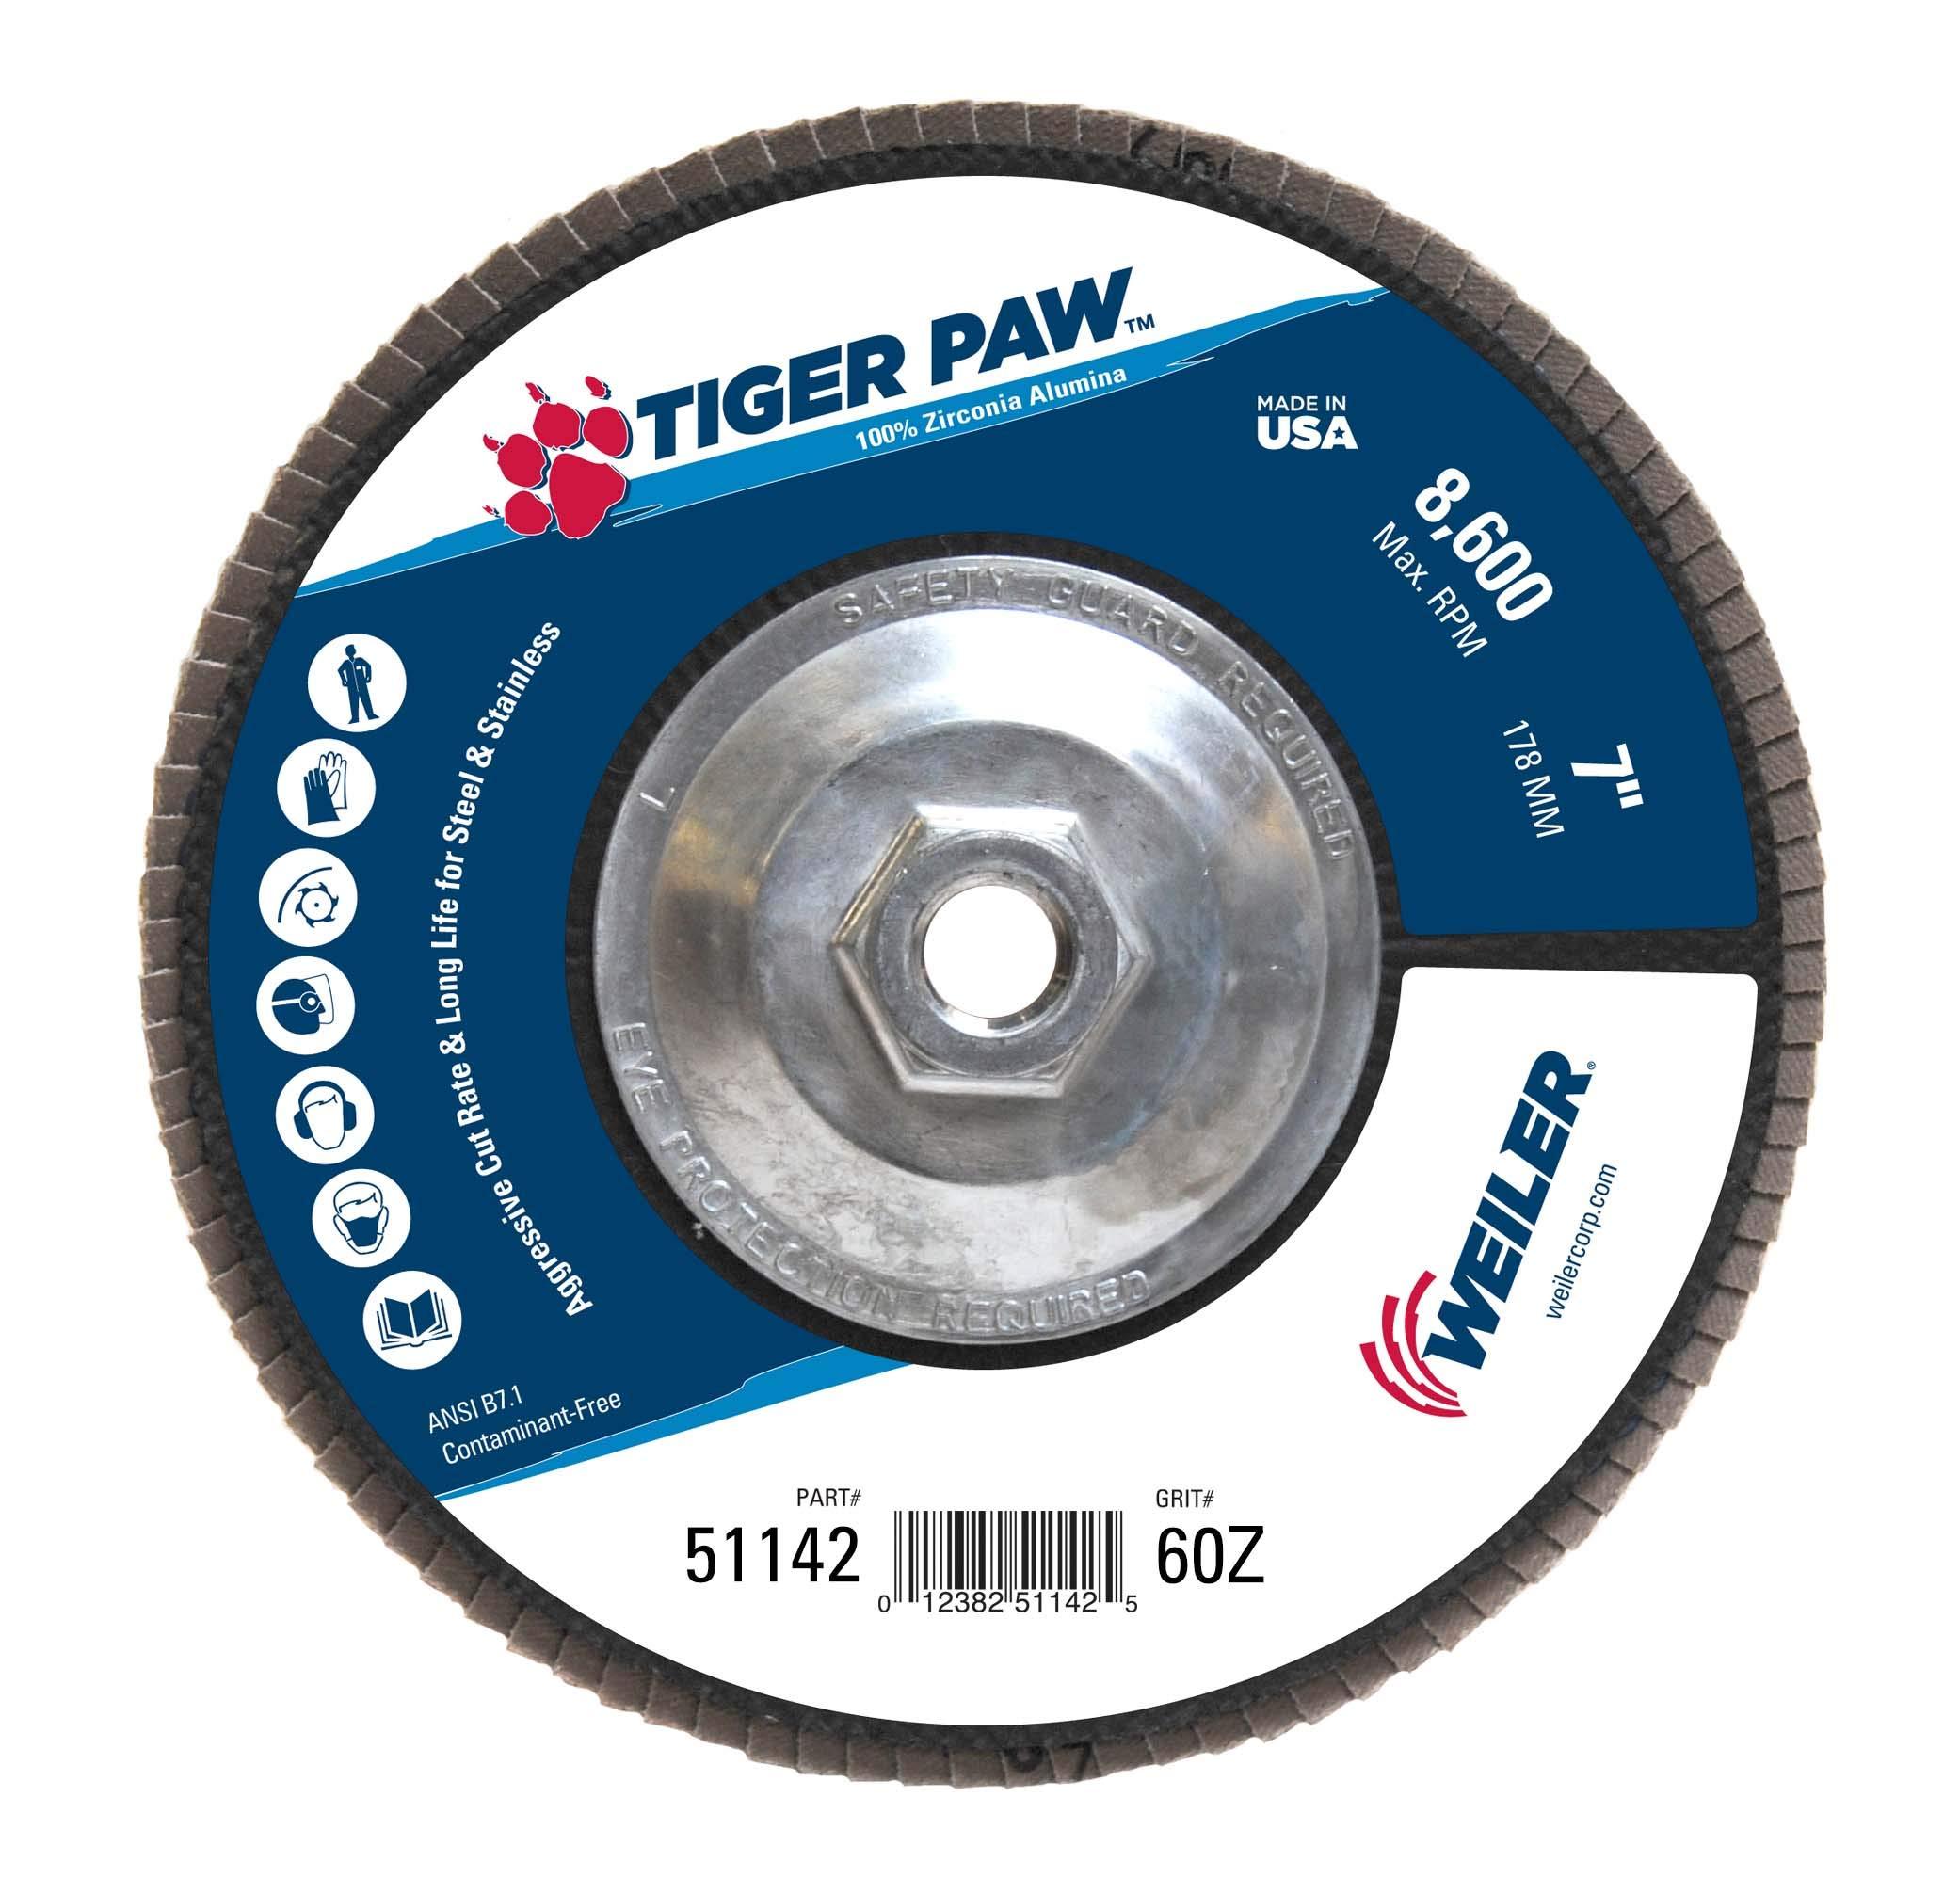 Weiler 51142 Tiger Paw High Performance Abrasive Flap Disc, Type 27 Flat Style, Phenolic Backing, Zirconia Alumina, 7'' Diameter, 5/8''-11 Arbor, 60 Grit, 8600 RPM (Pack of 10)